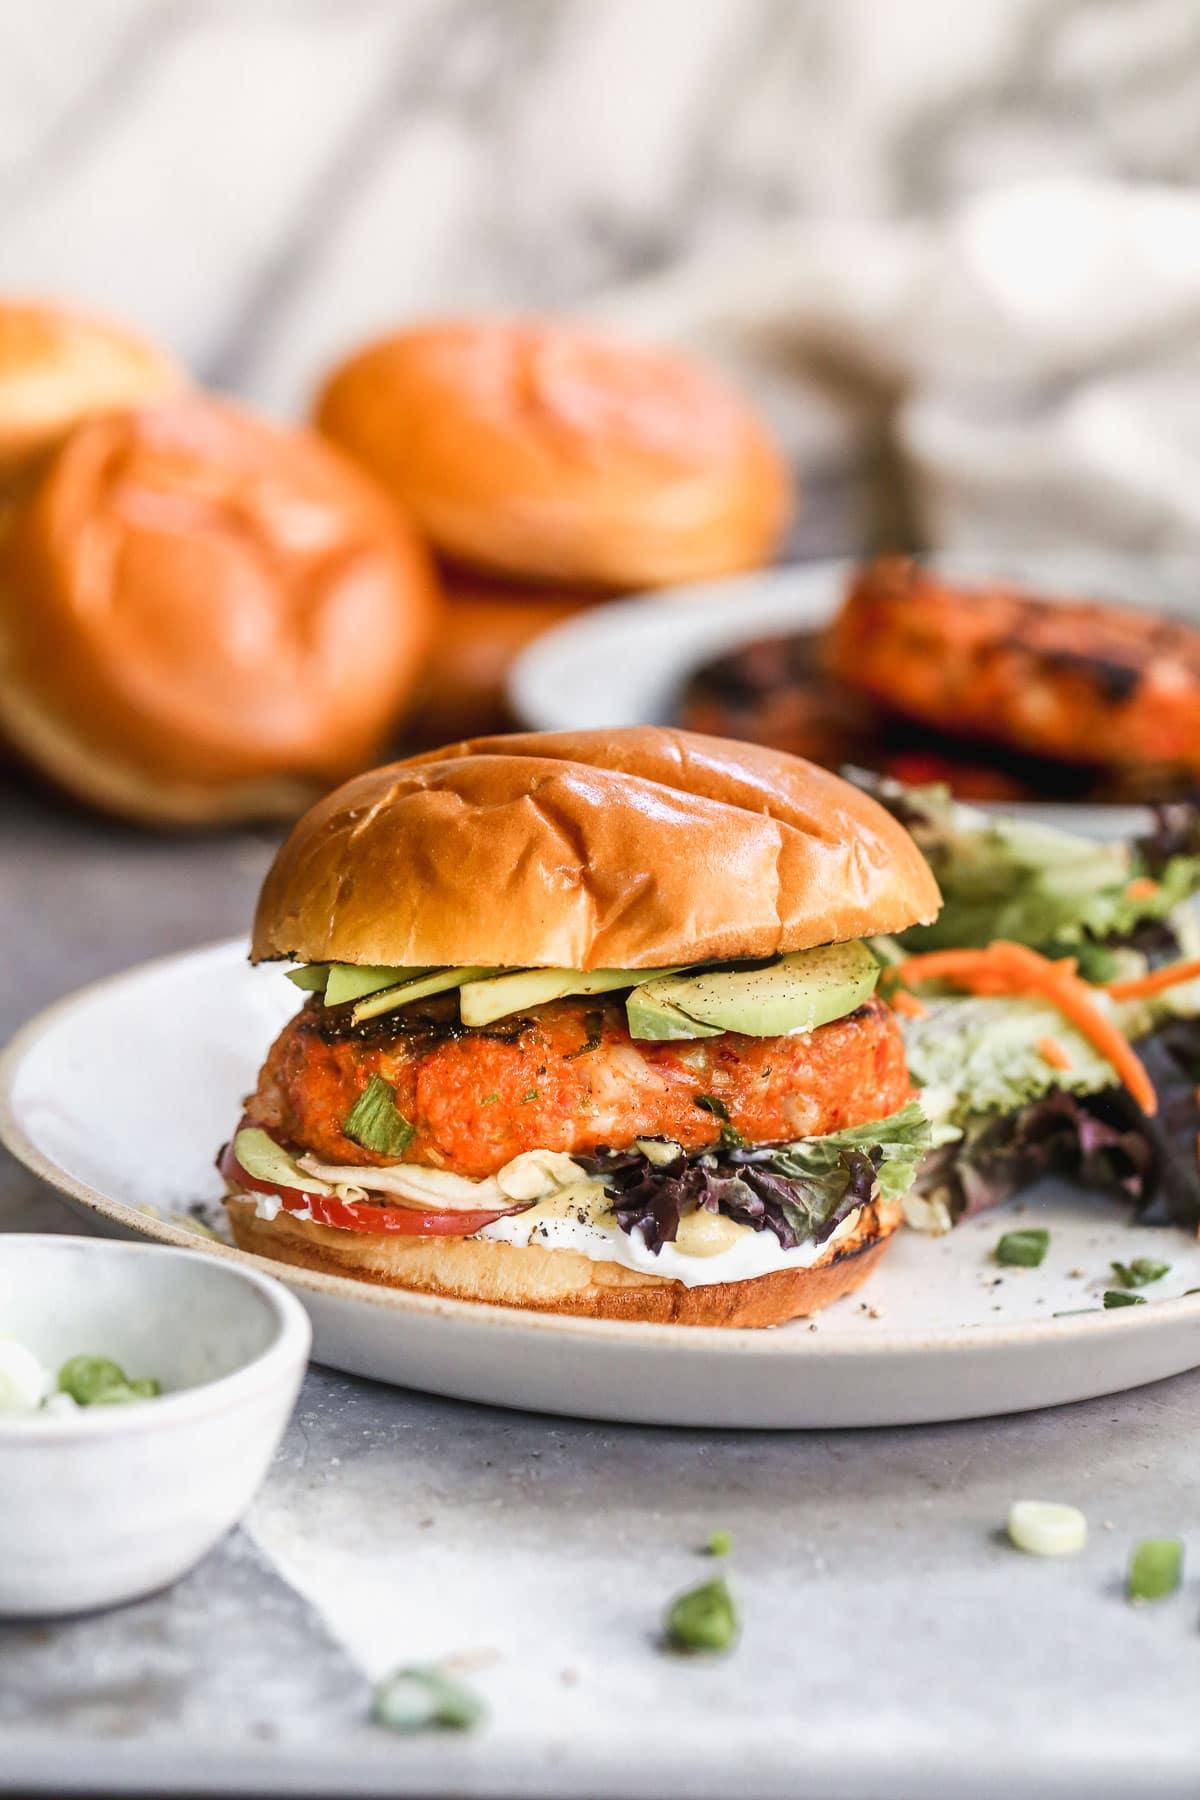 Southern shrimp burger on a plate